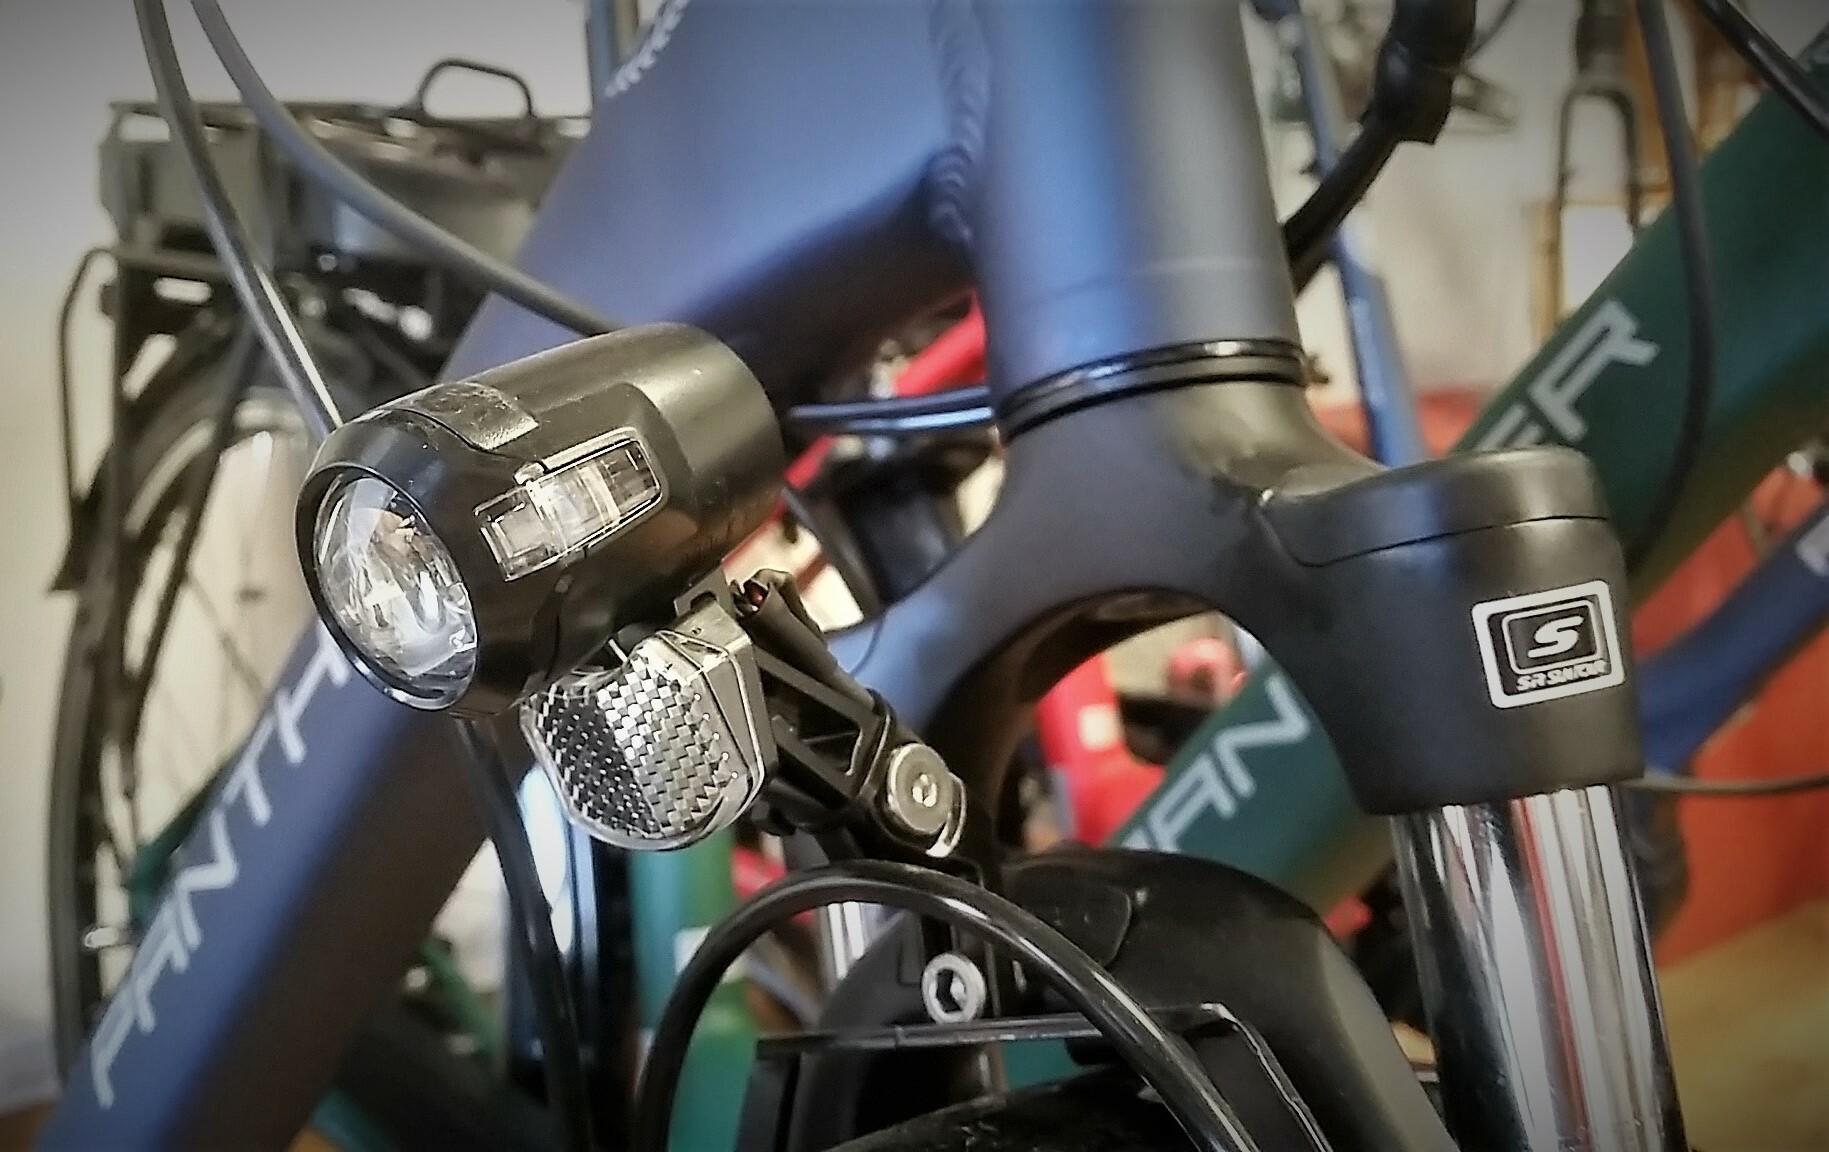 bosch-e-bike-jubilum-aktion-wrist.jpg